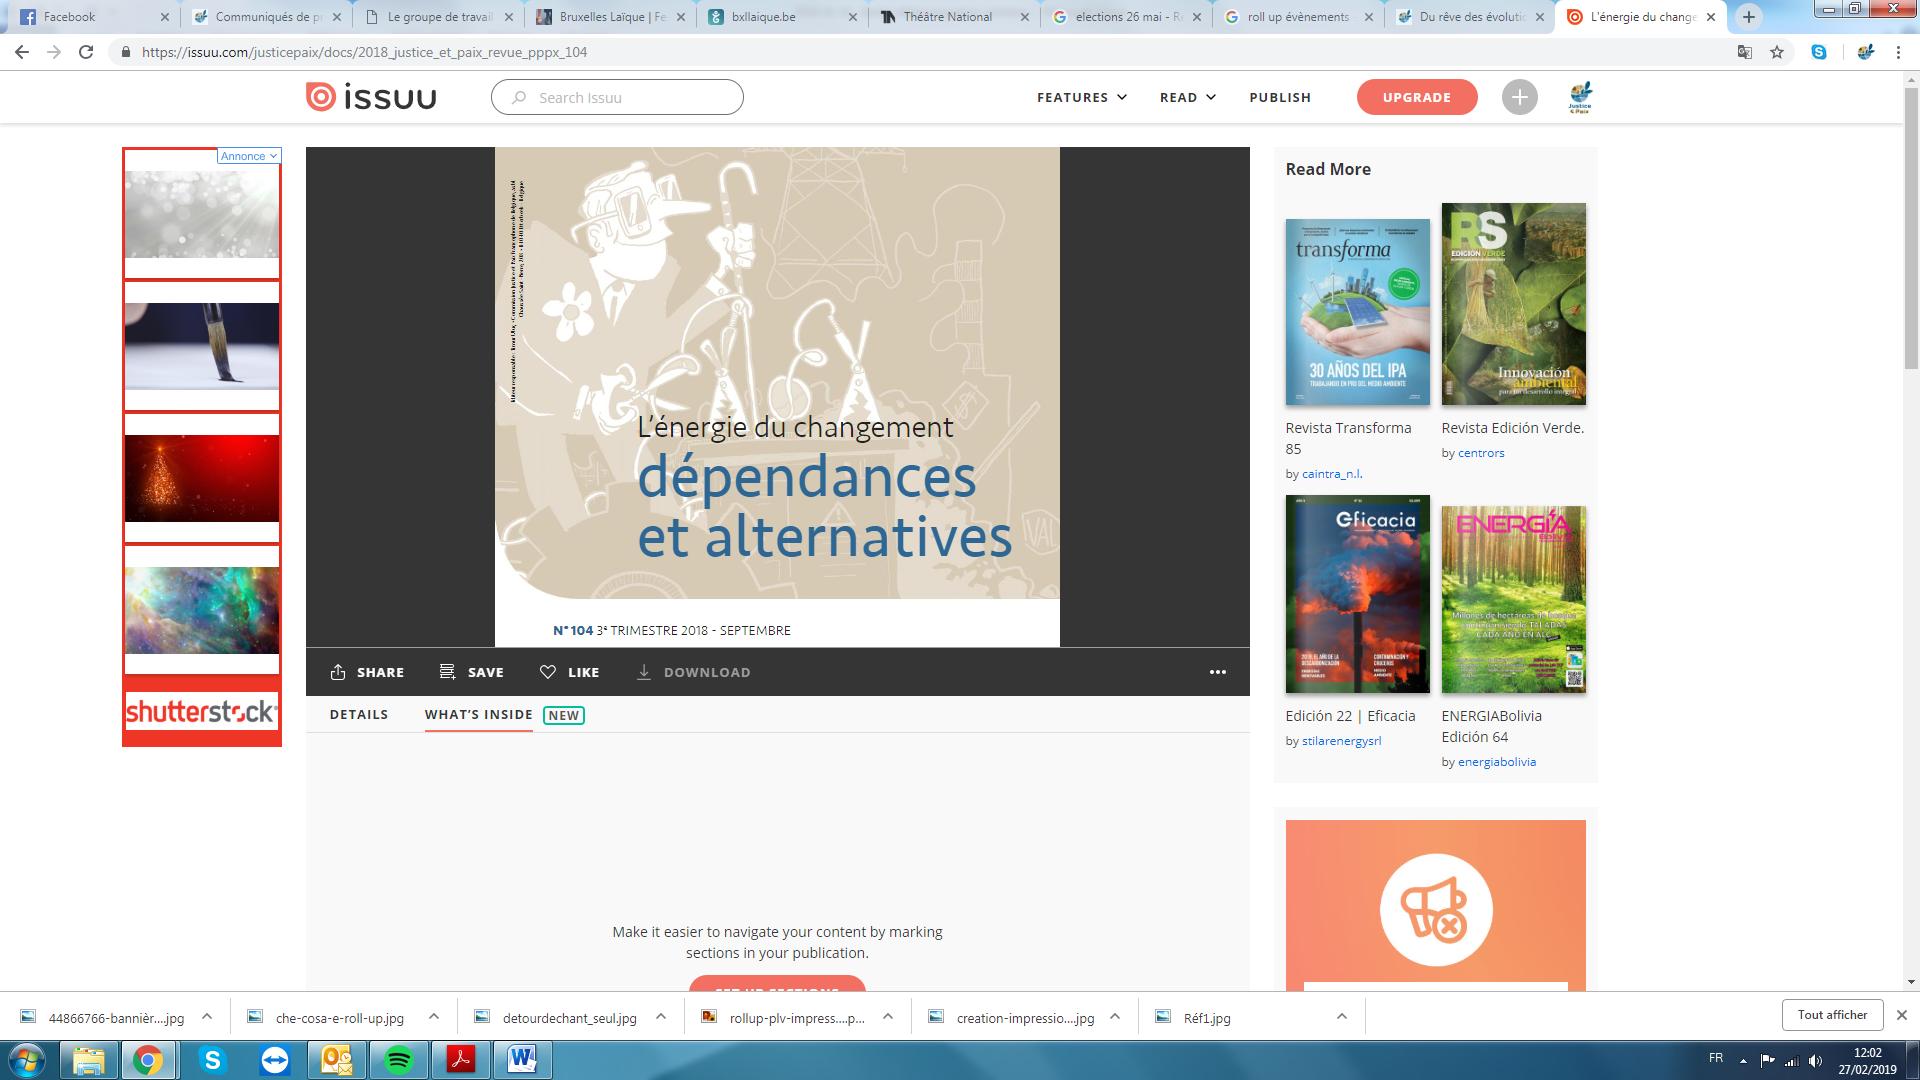 dependances_et_alertnatives.png